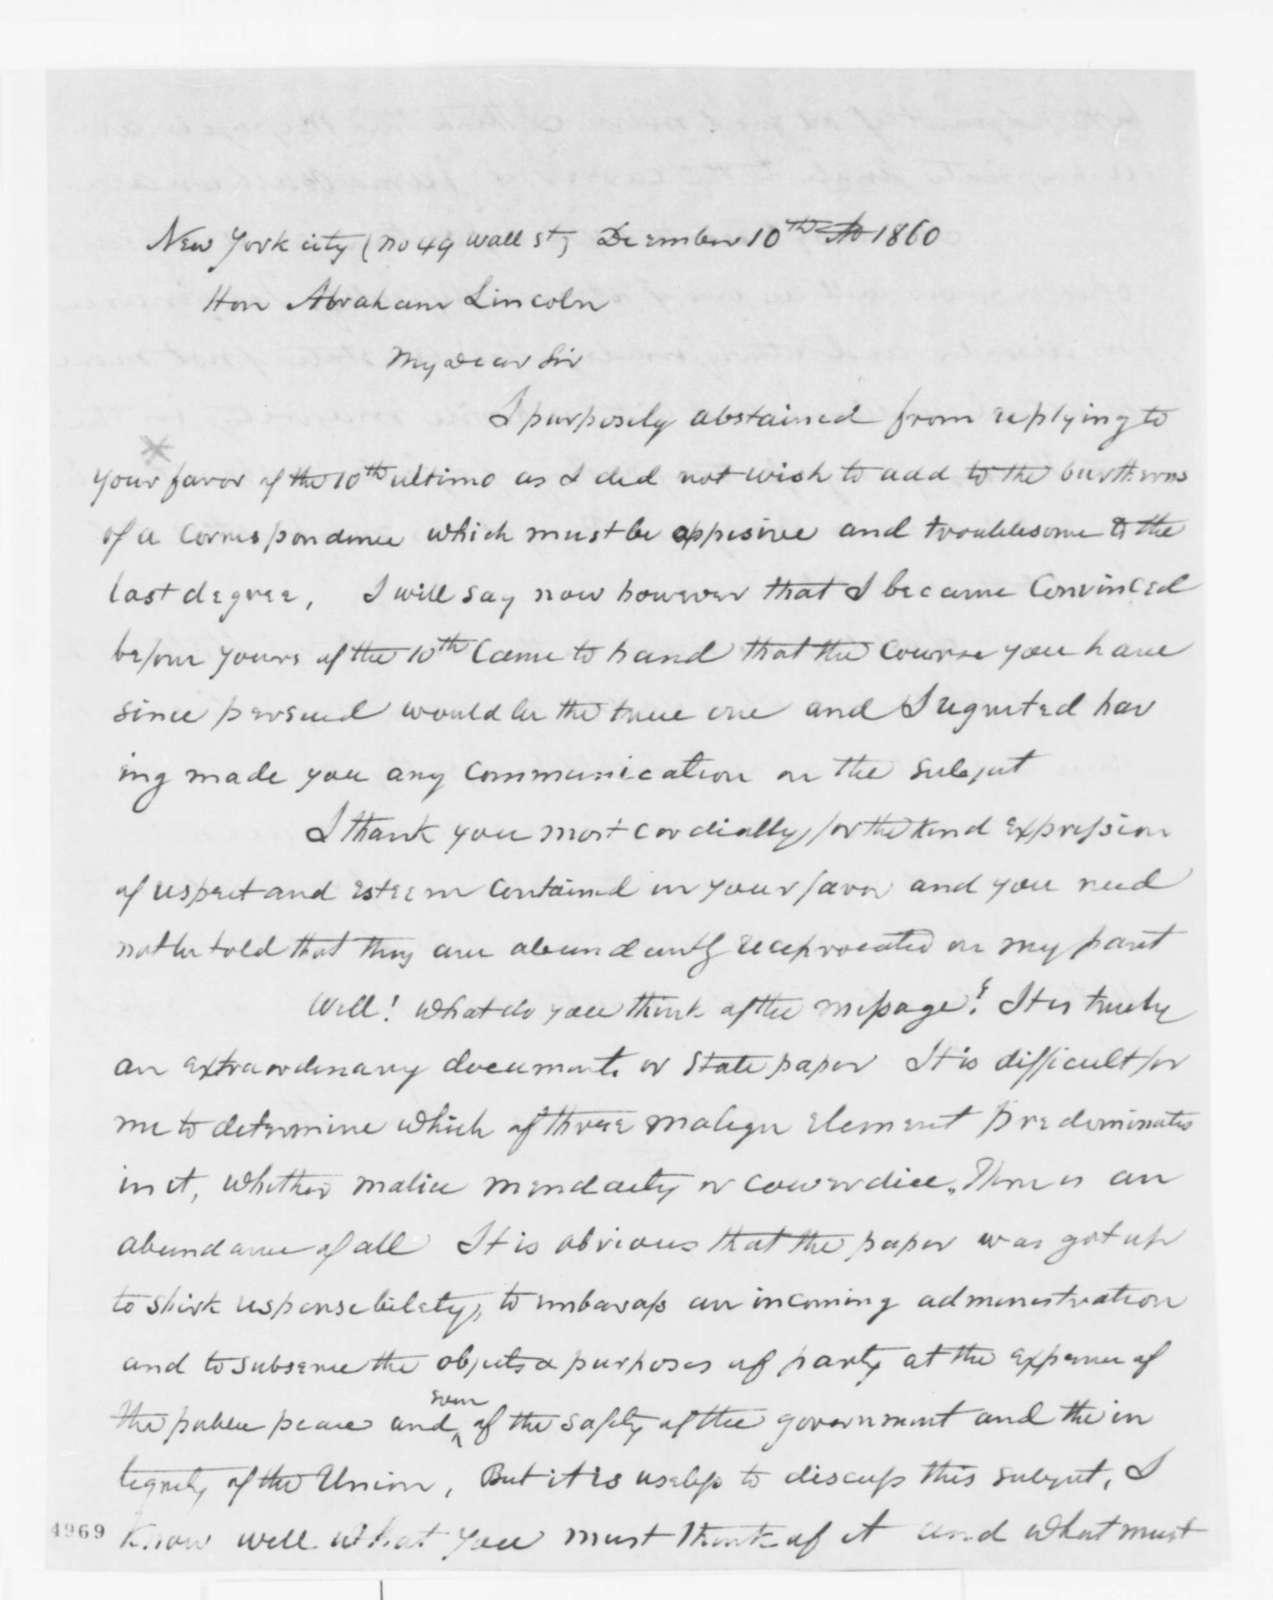 Truman Smith to Abraham Lincoln, Monday, December 10, 1860  (Buchanan's Annual Message)